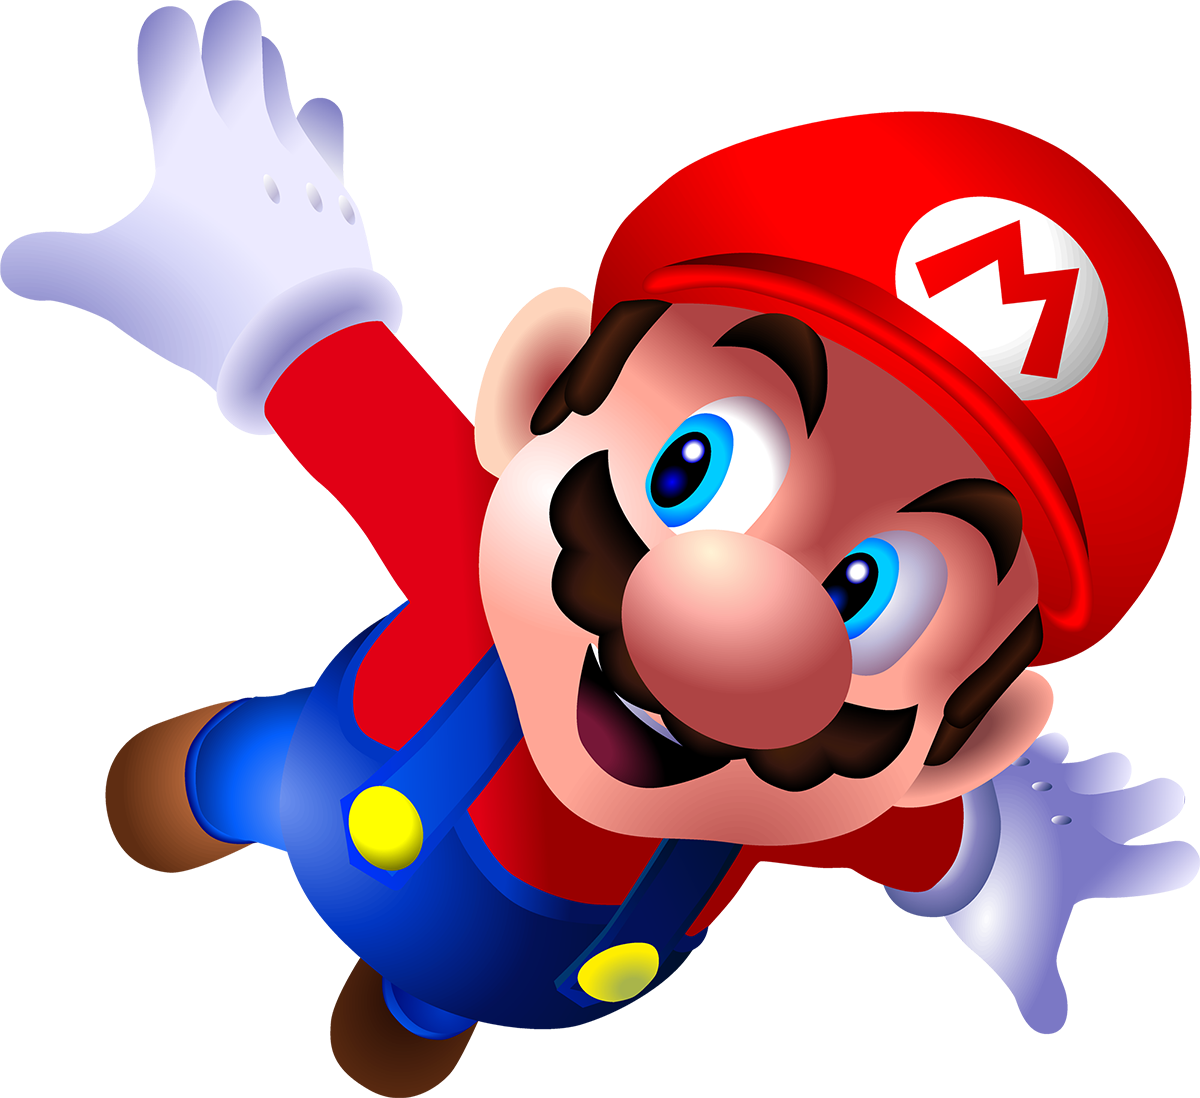 Images png. Mario image purepng free